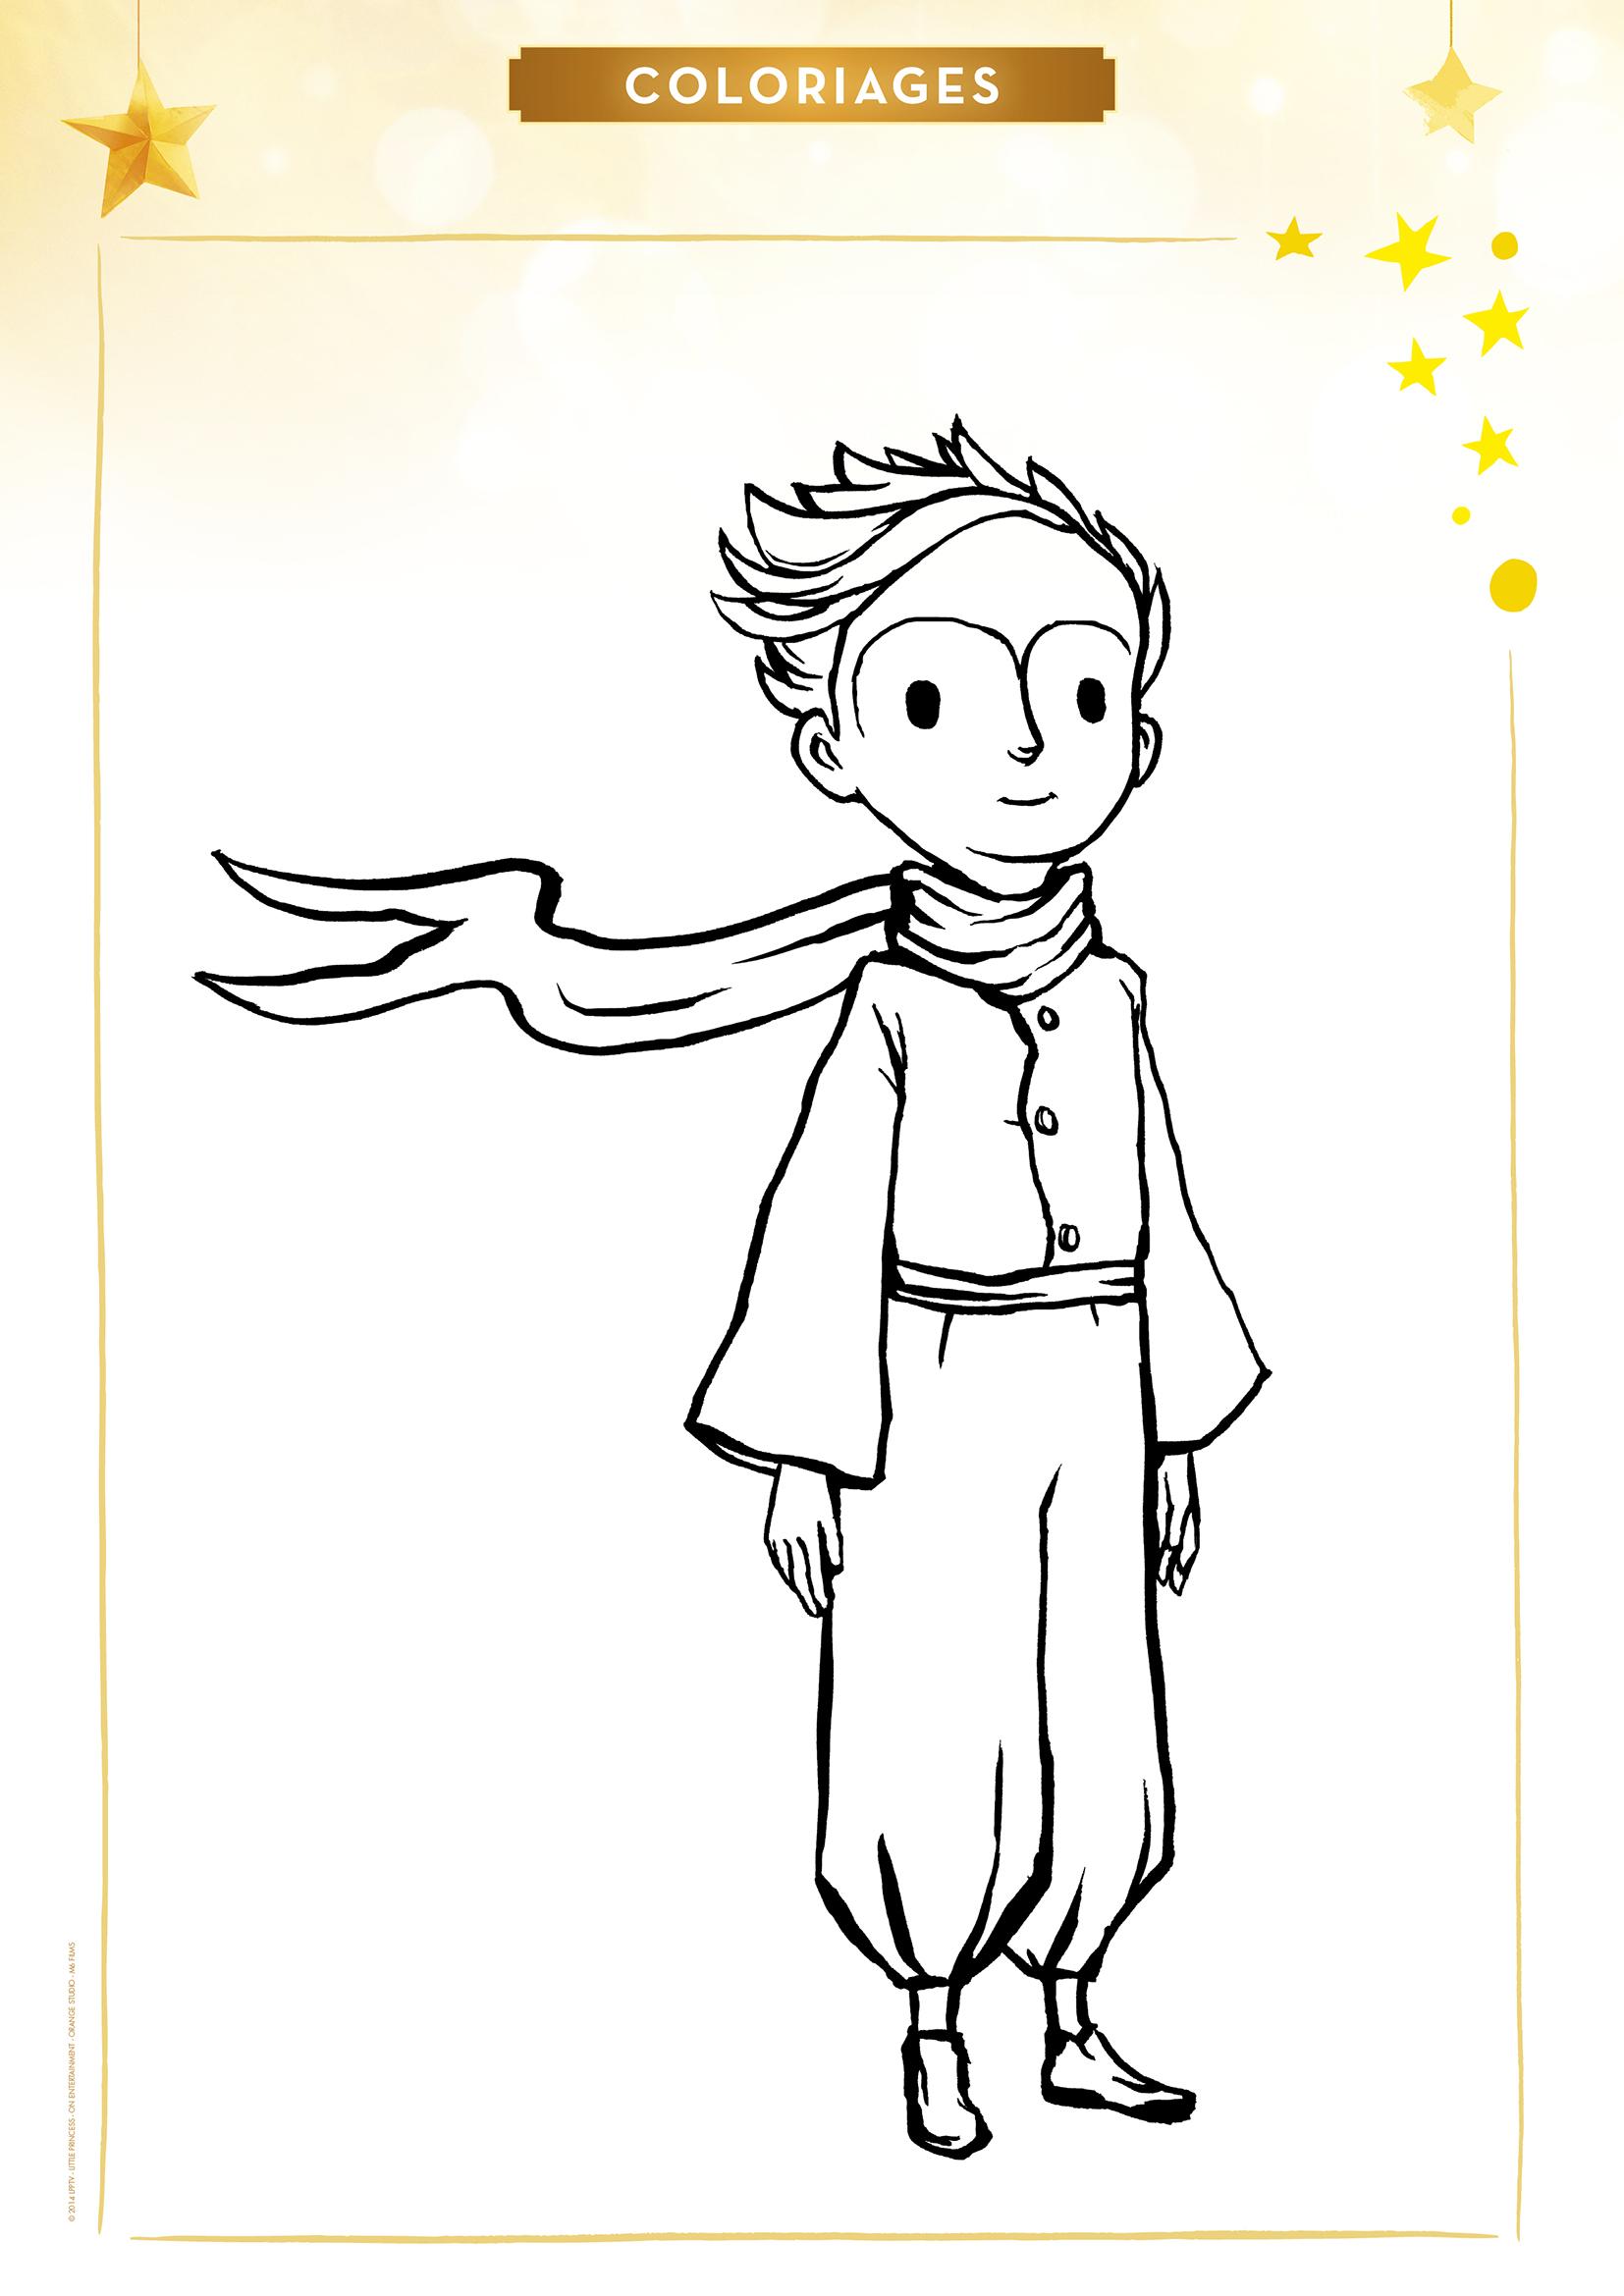 Coloriage le petit prince - Coloriage petit renard ...